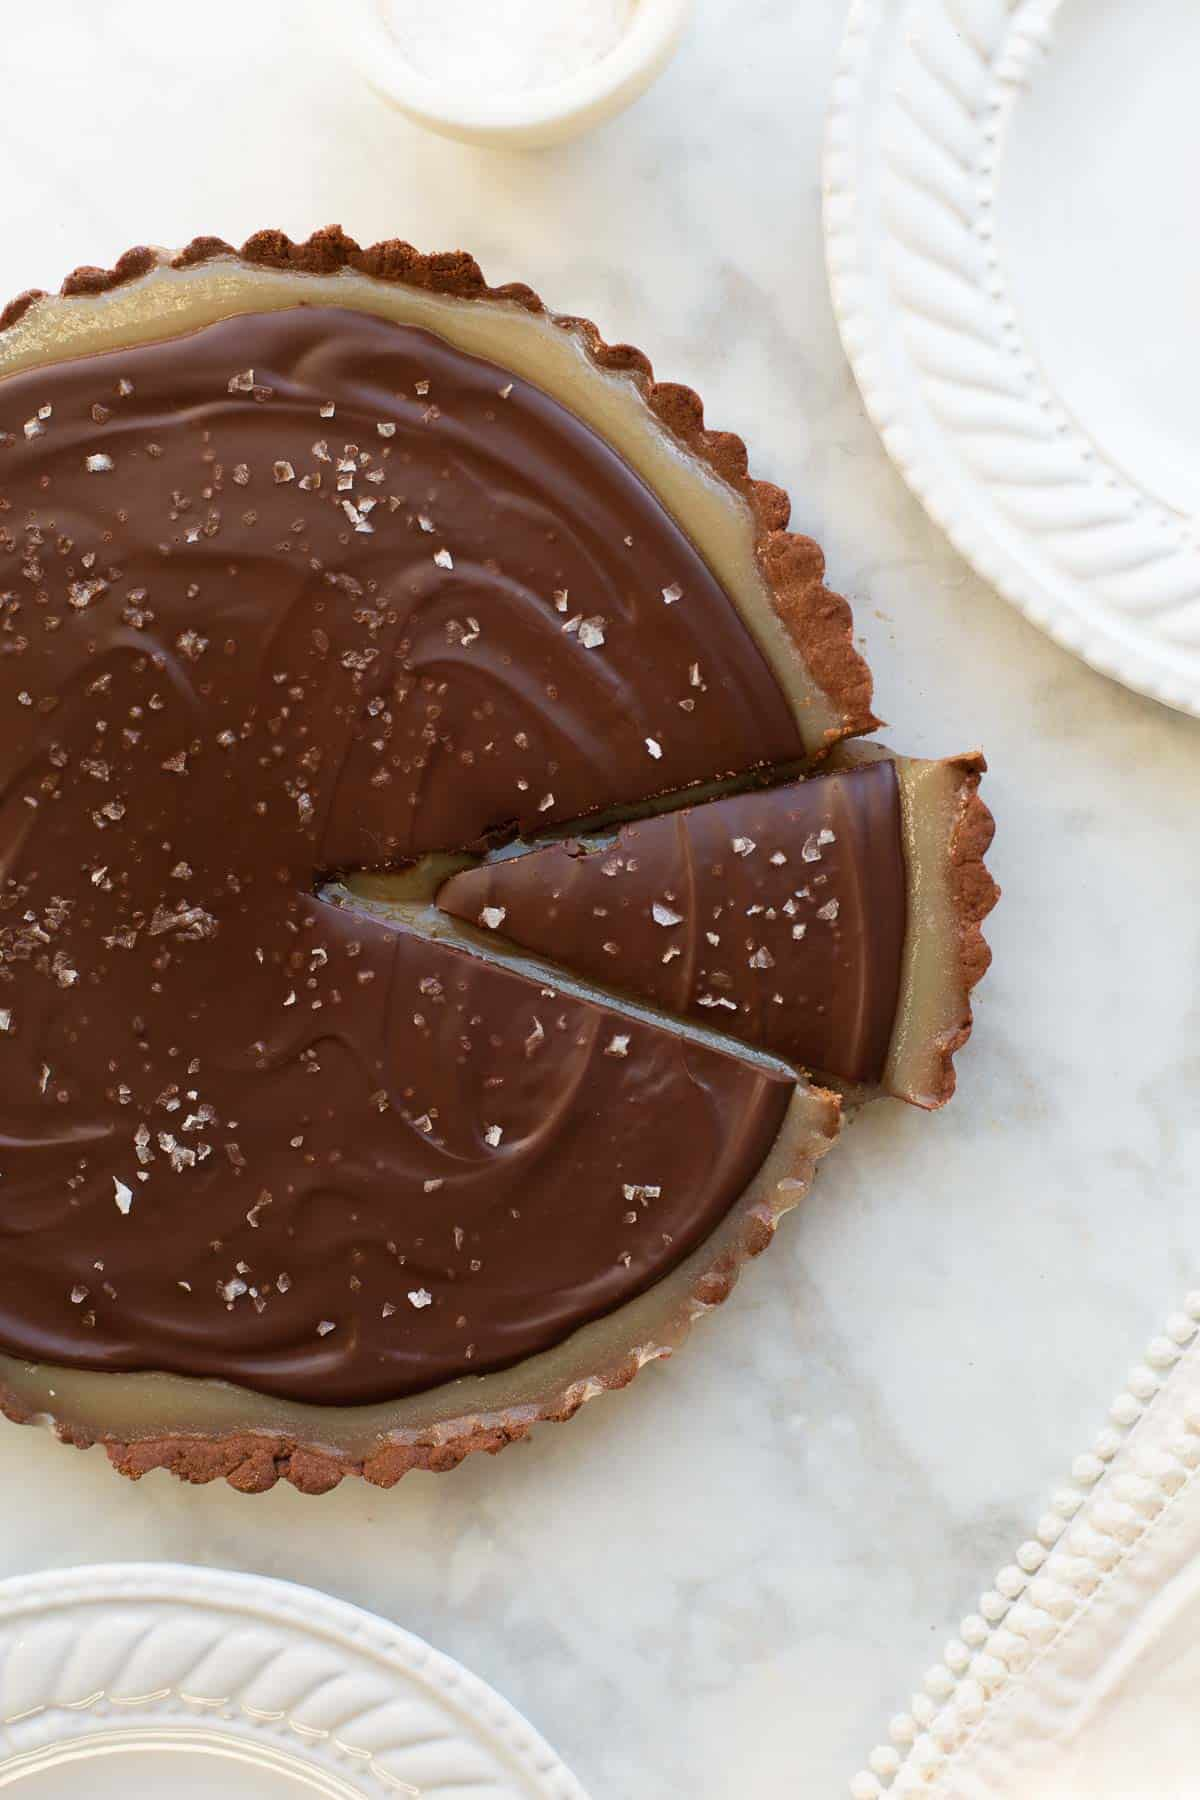 chocolate caramel tart with slice